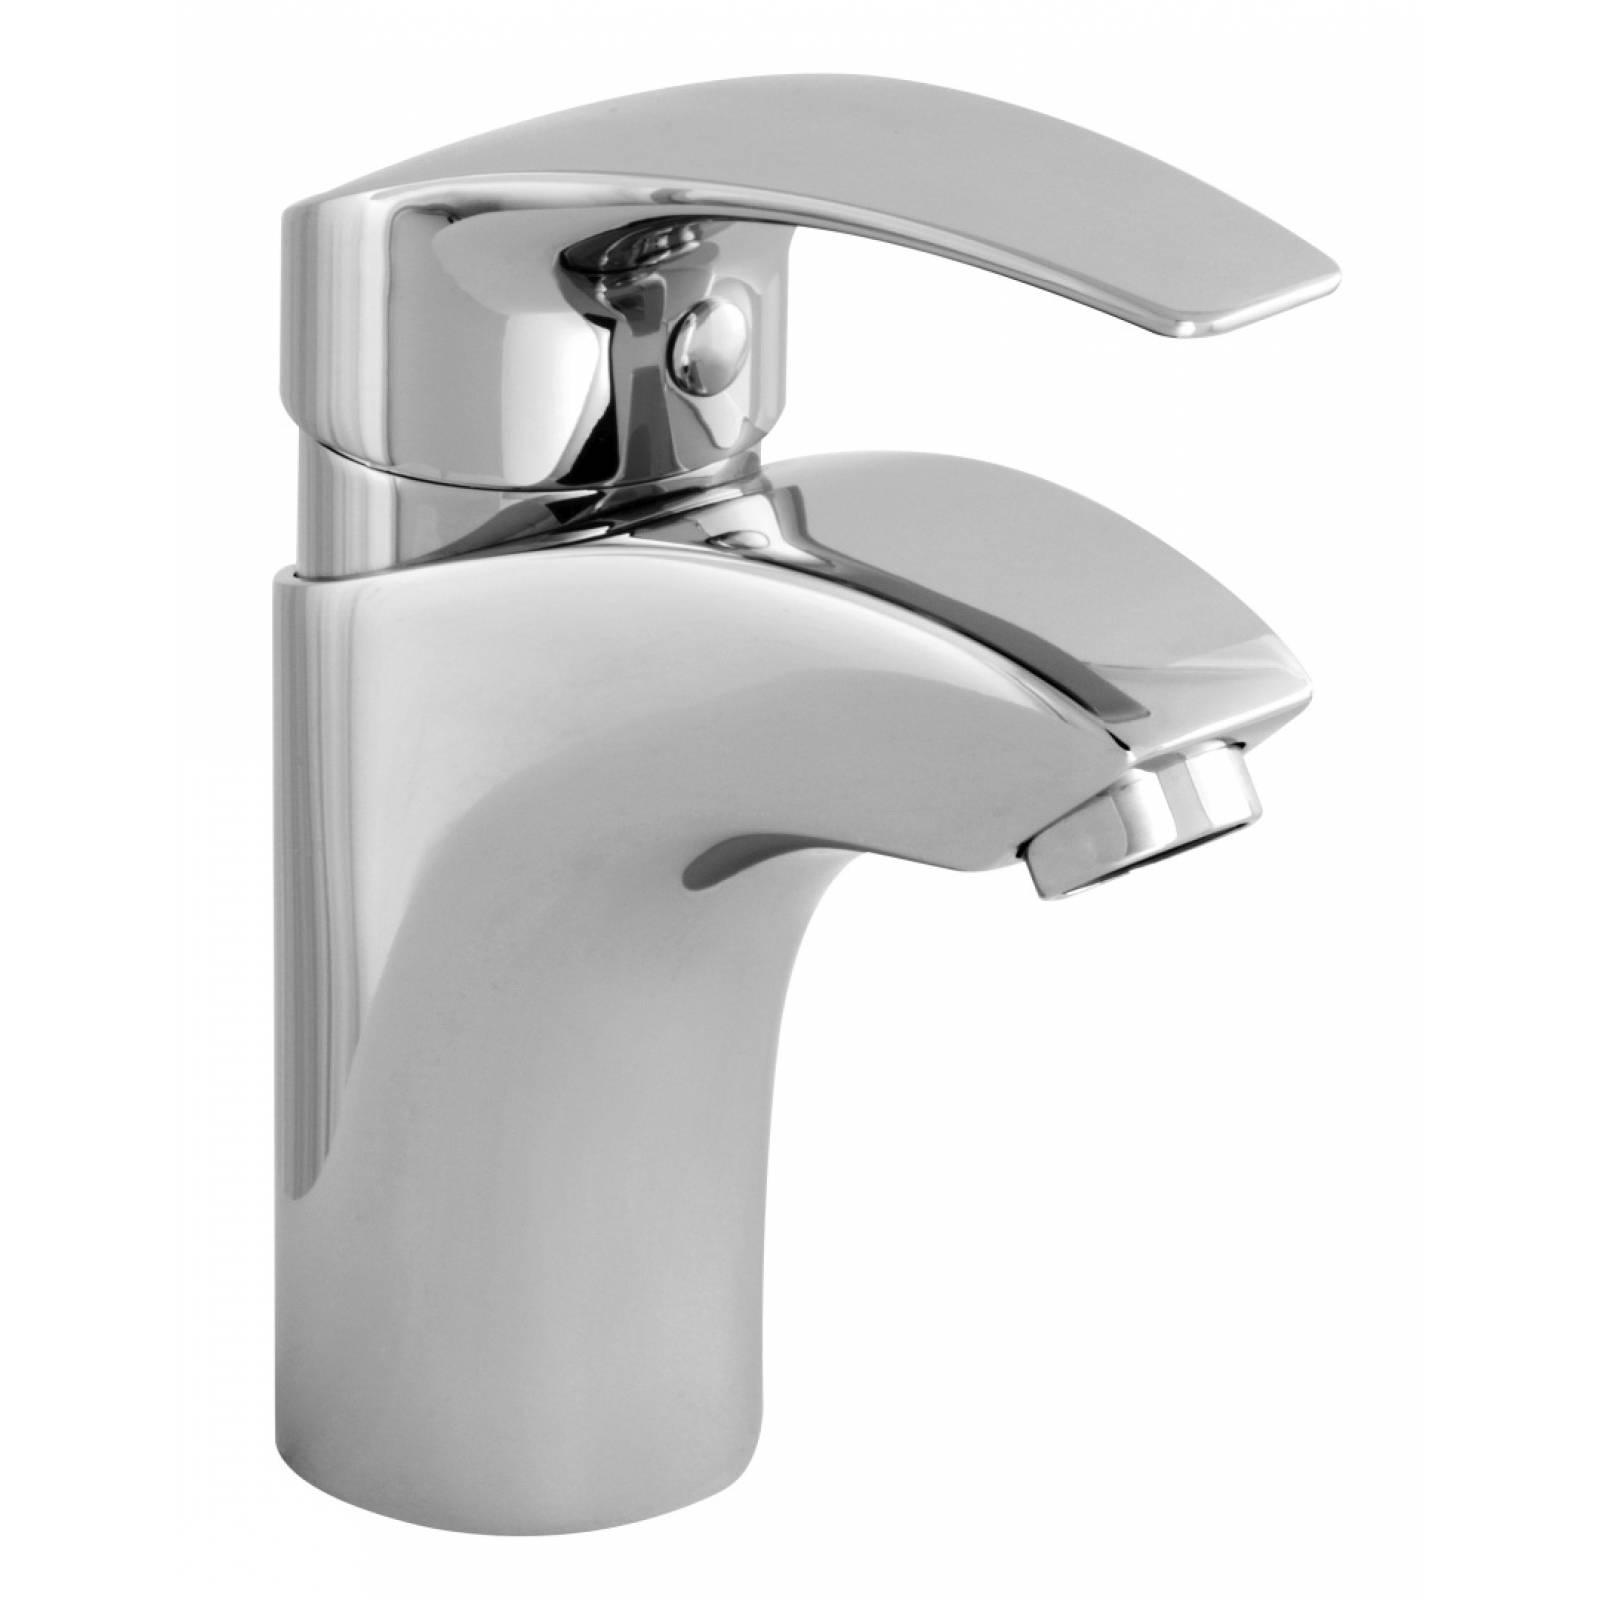 Monomando para lavabo YAZ 611YZ.9 URREA